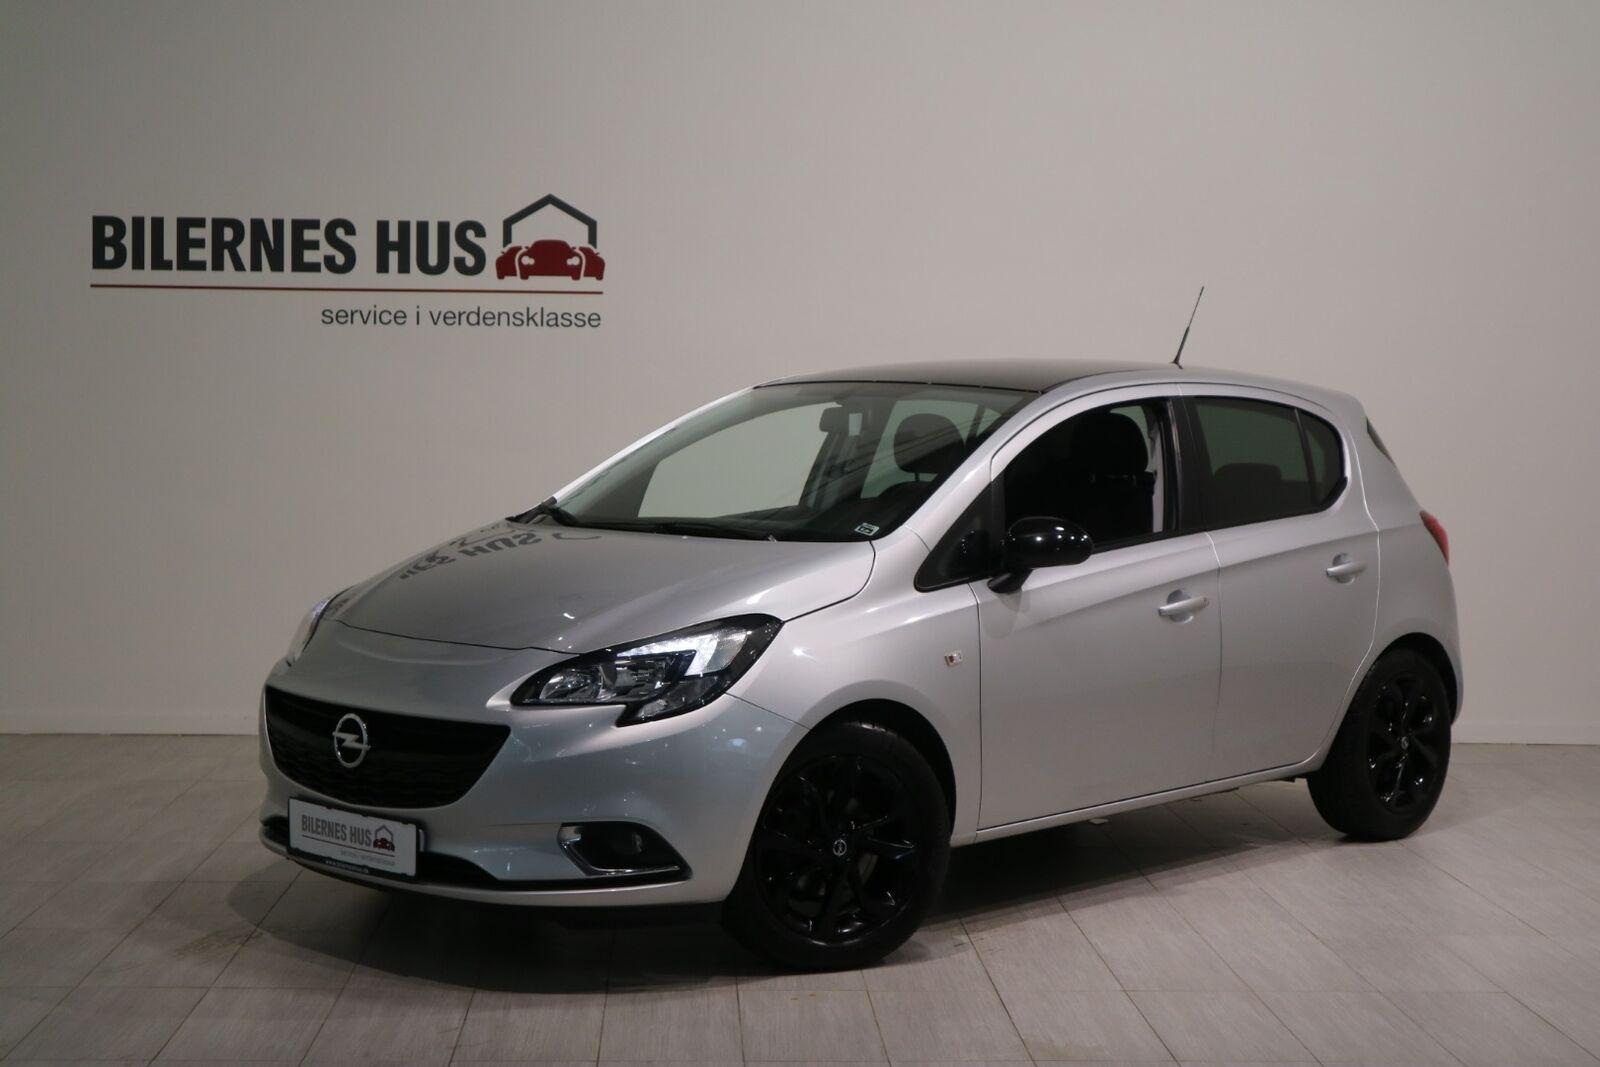 Opel Corsa Billede 4